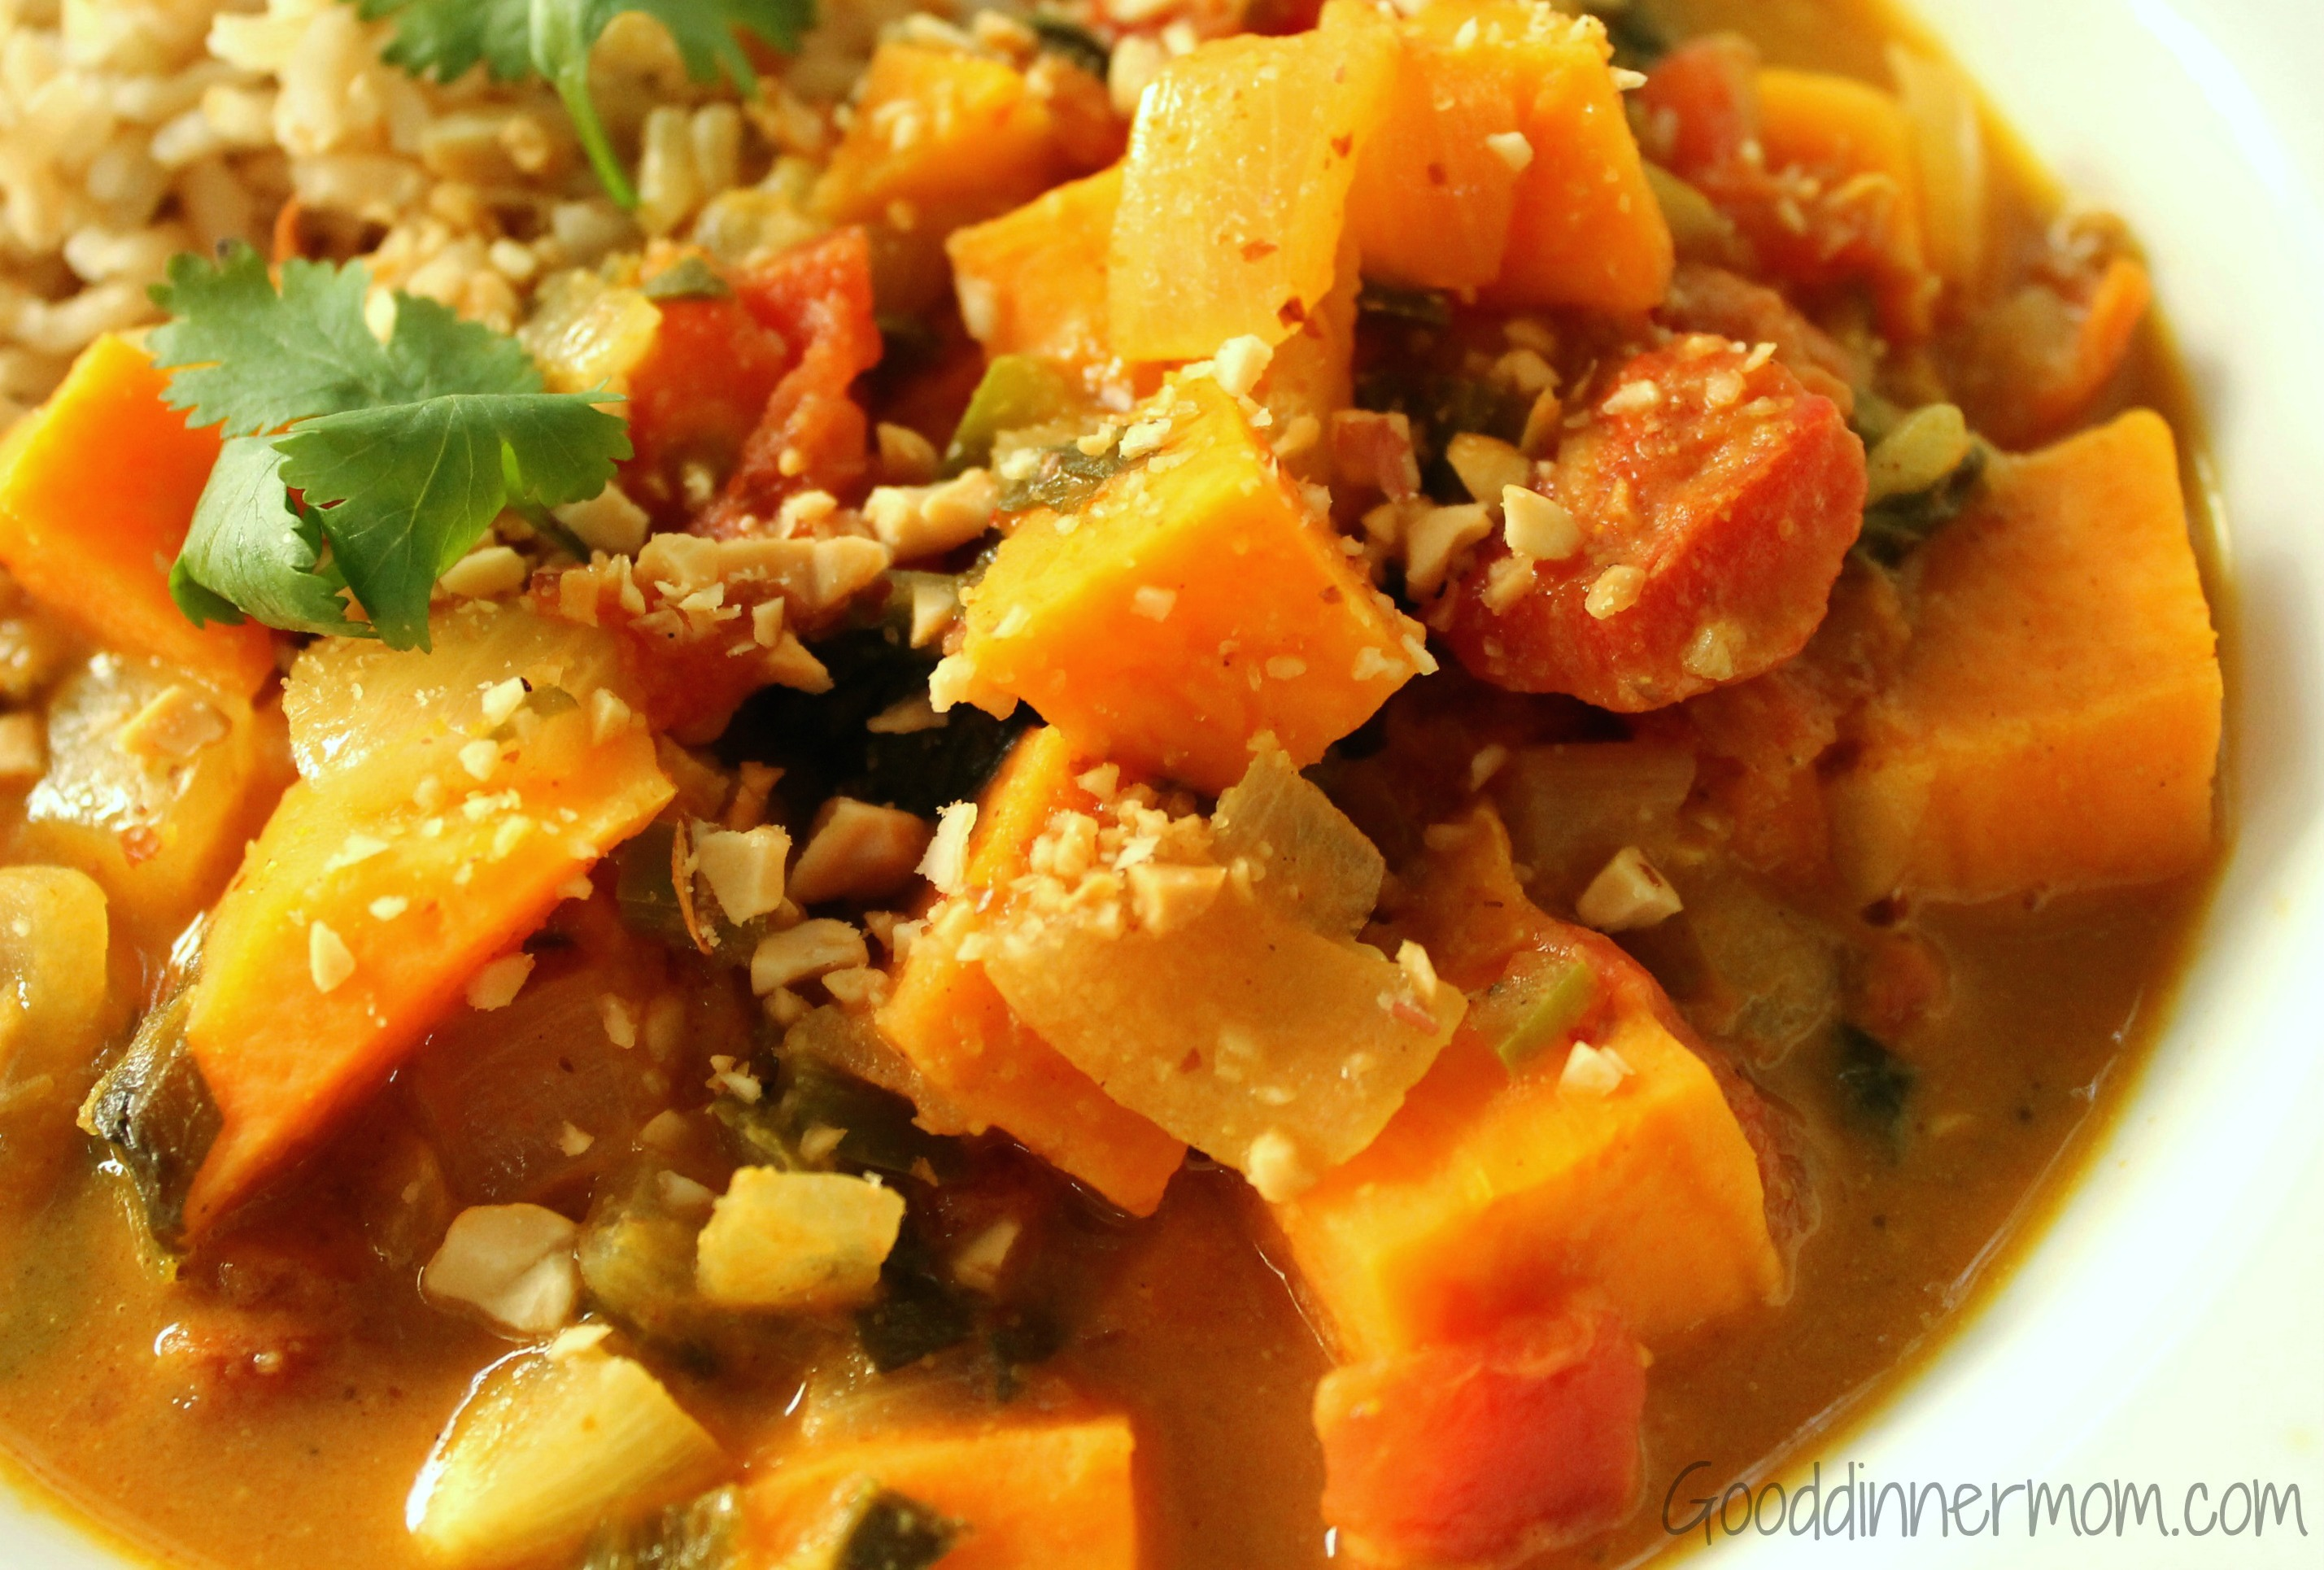 Good Dinner Mom | African Peanut Stew - Good Dinner Mom